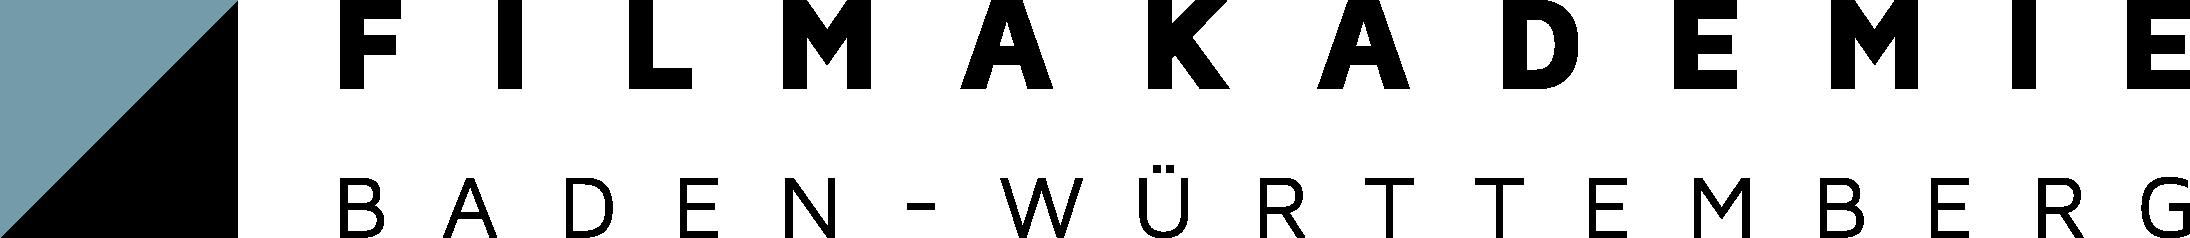 Filmproduktion Smartfilmmedia - Filmakademie Baden-Württemberg Logo